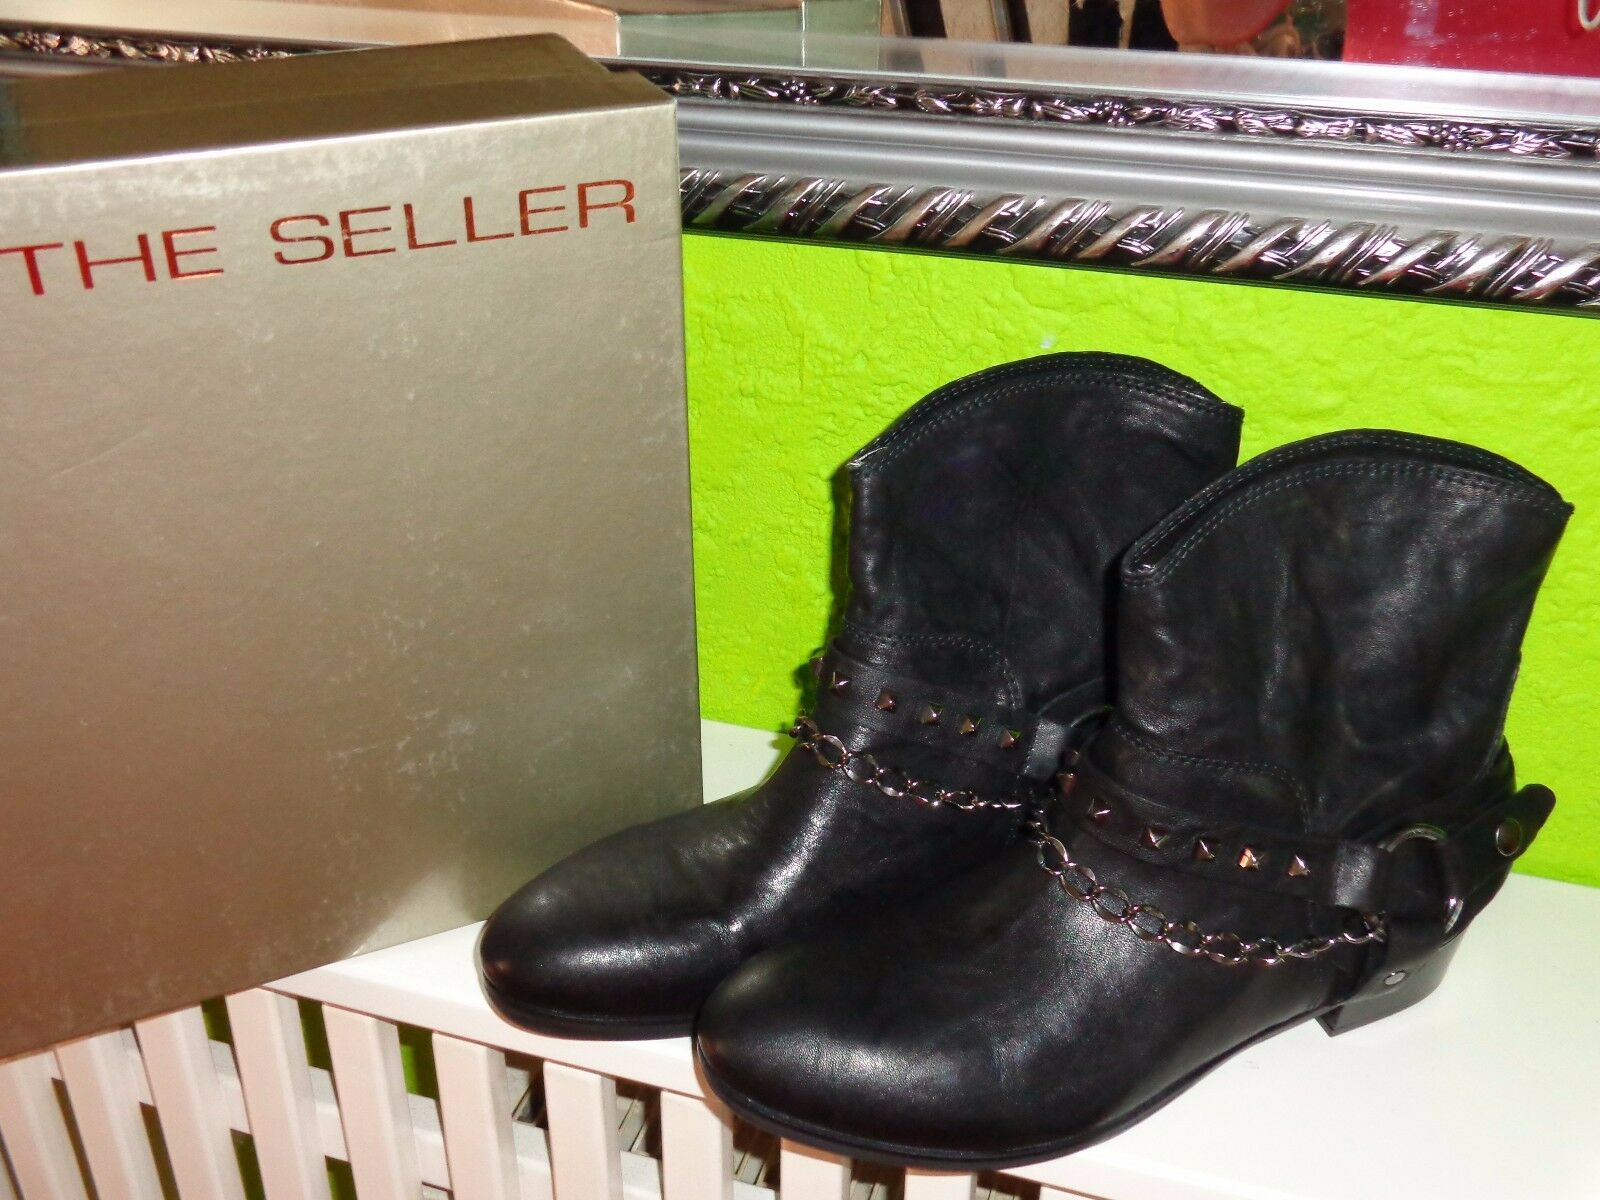 The Seller Stiefeletten Stiefel Leder Neu Schwarz  Gr. 39,5 Neu Leder 0458eb